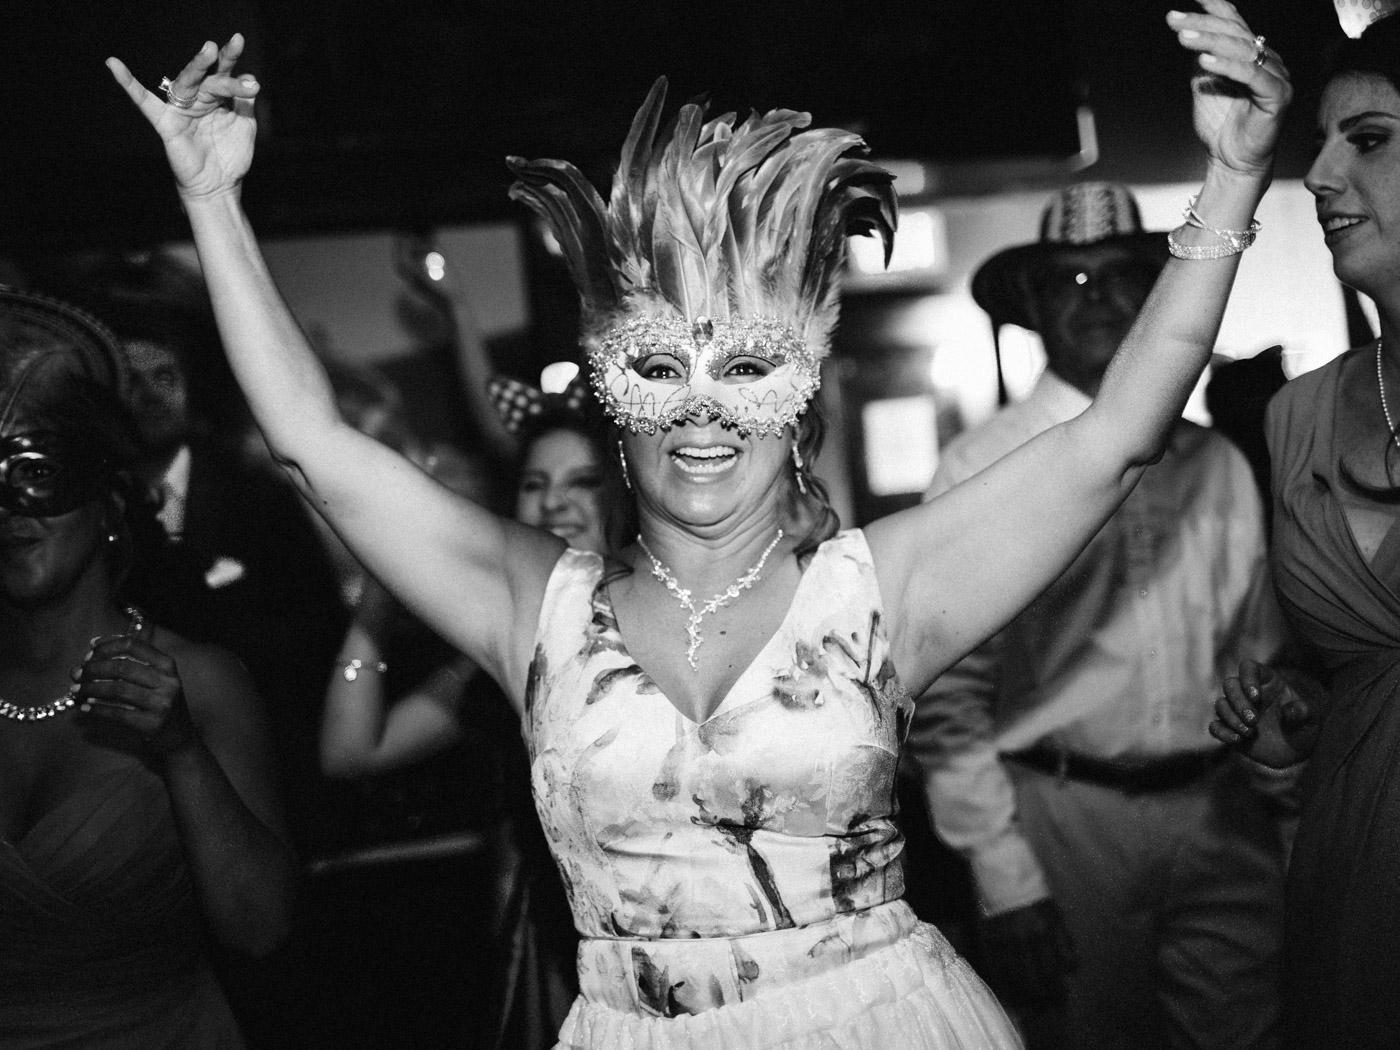 toronto_wedding_photographer_fine_art_documentary-661.jpg